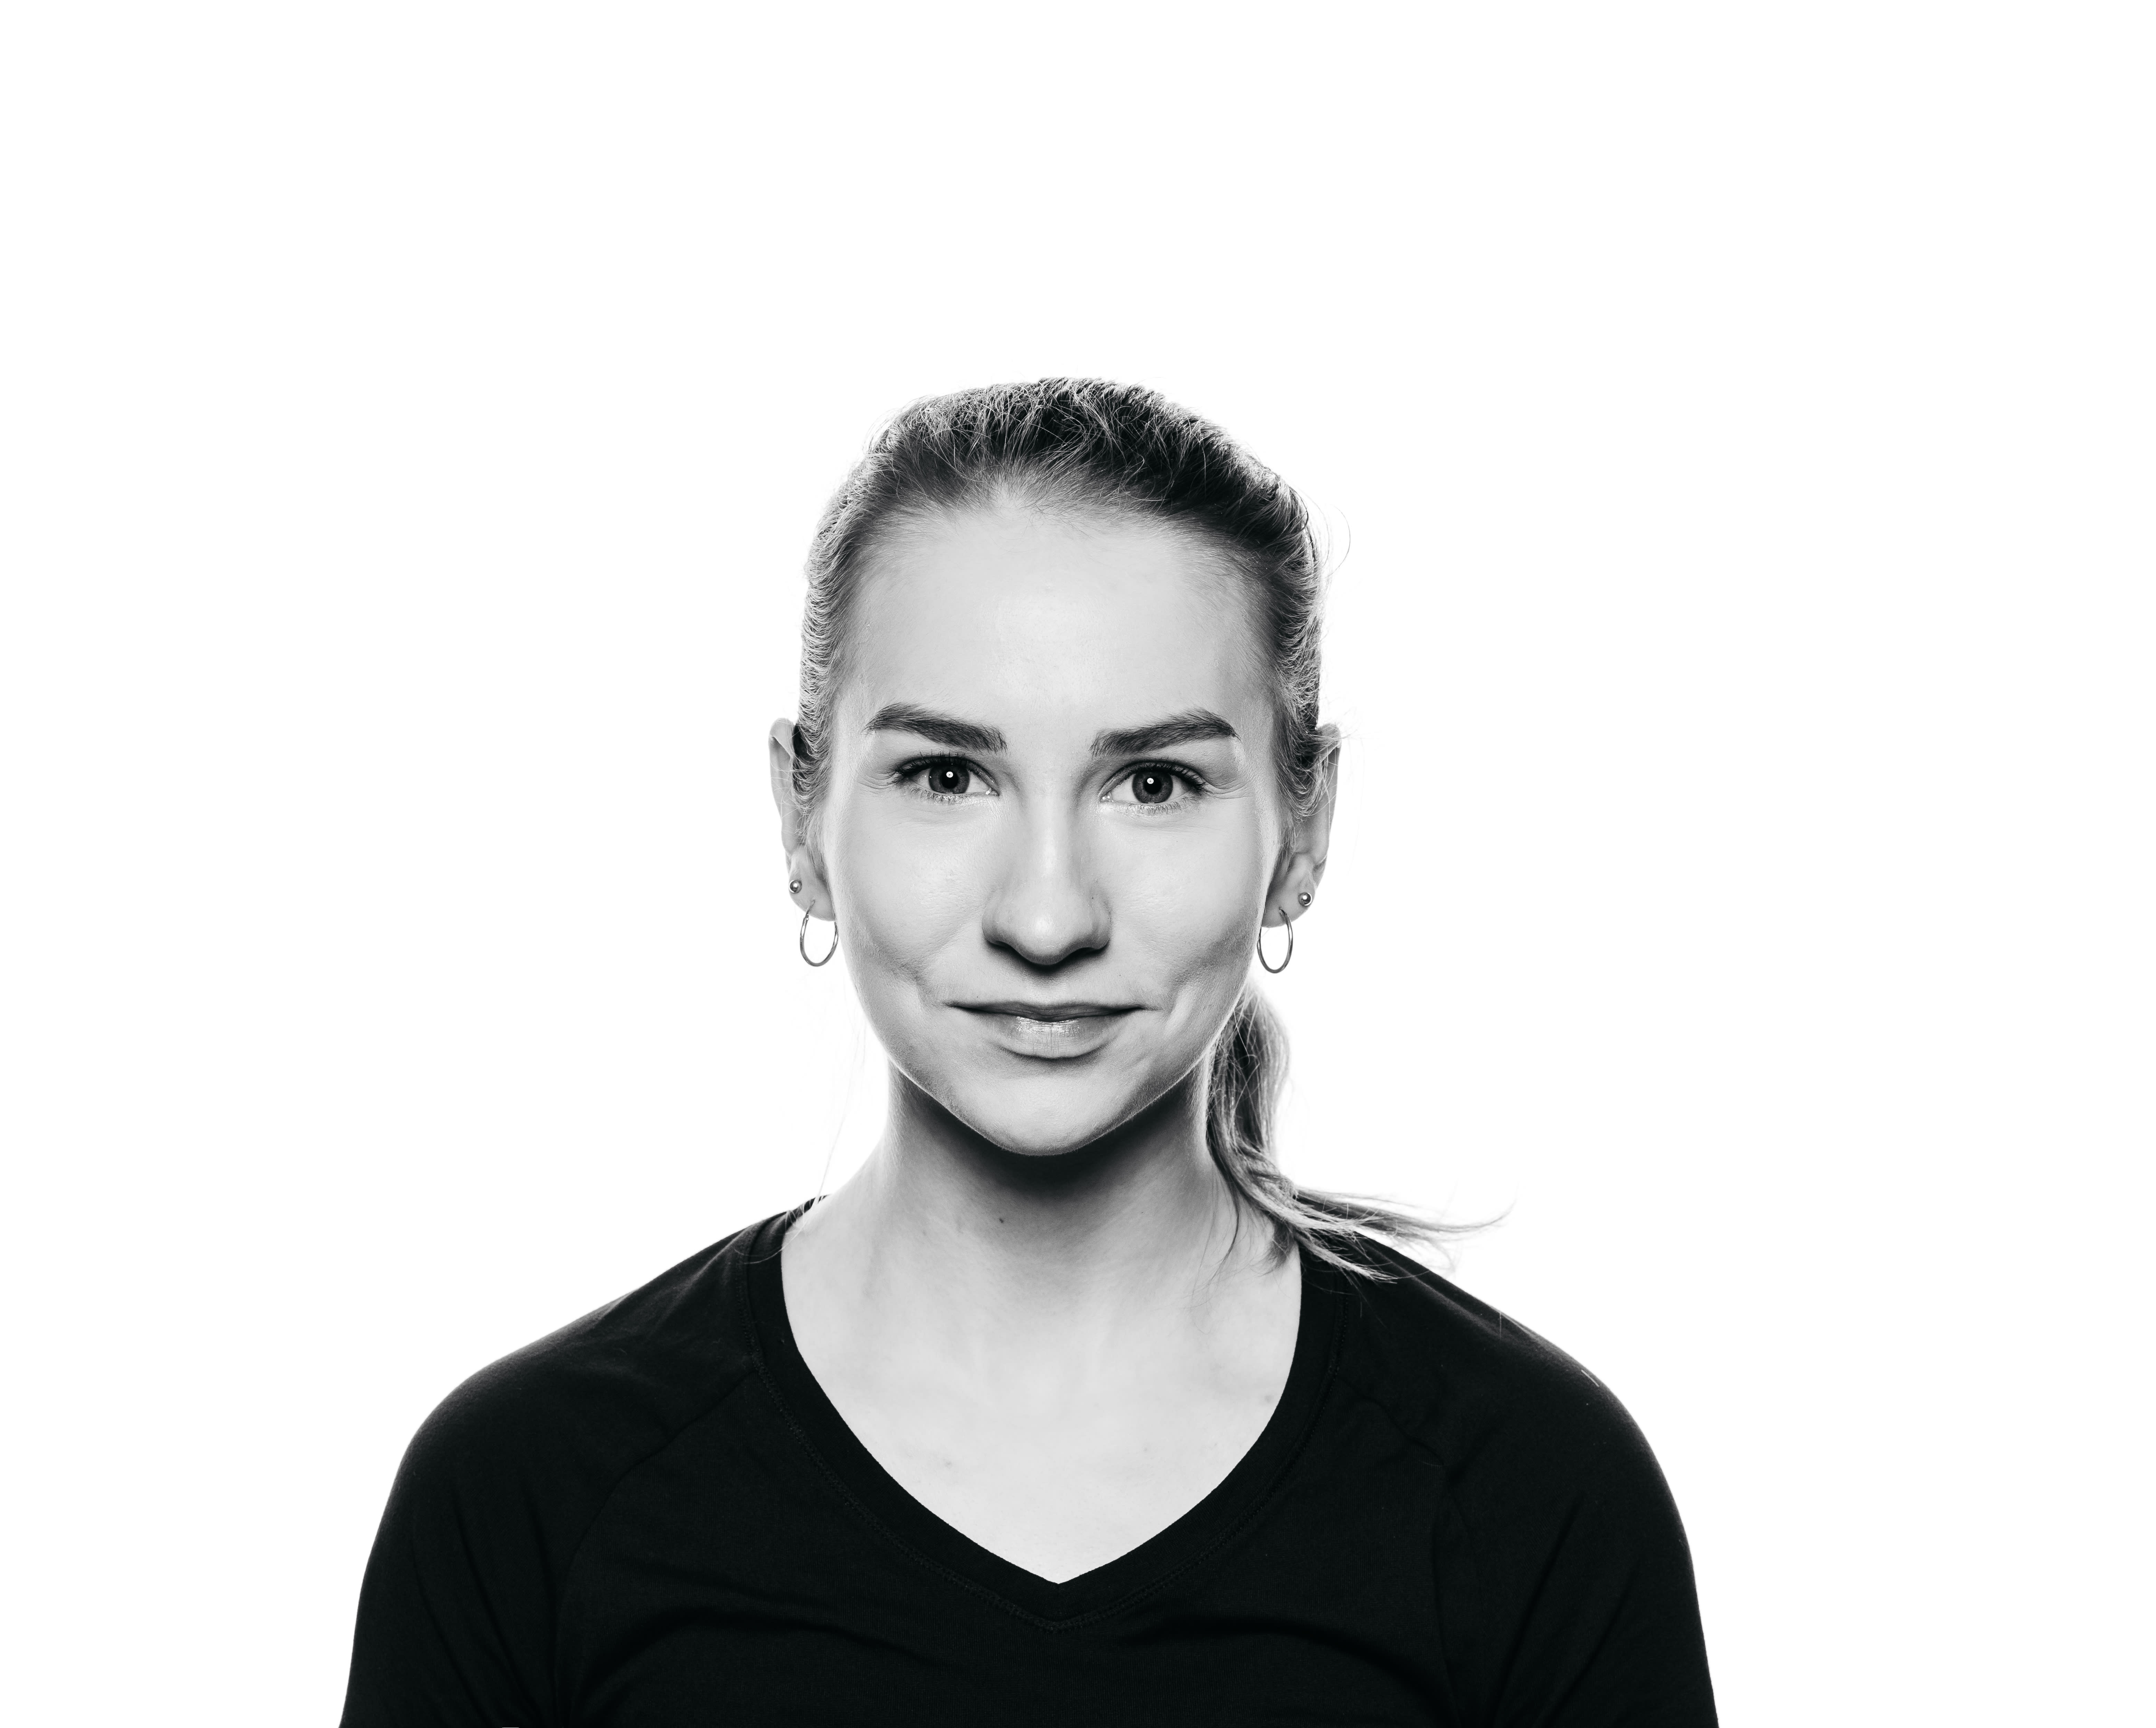 Sofie Kjær Præstmark